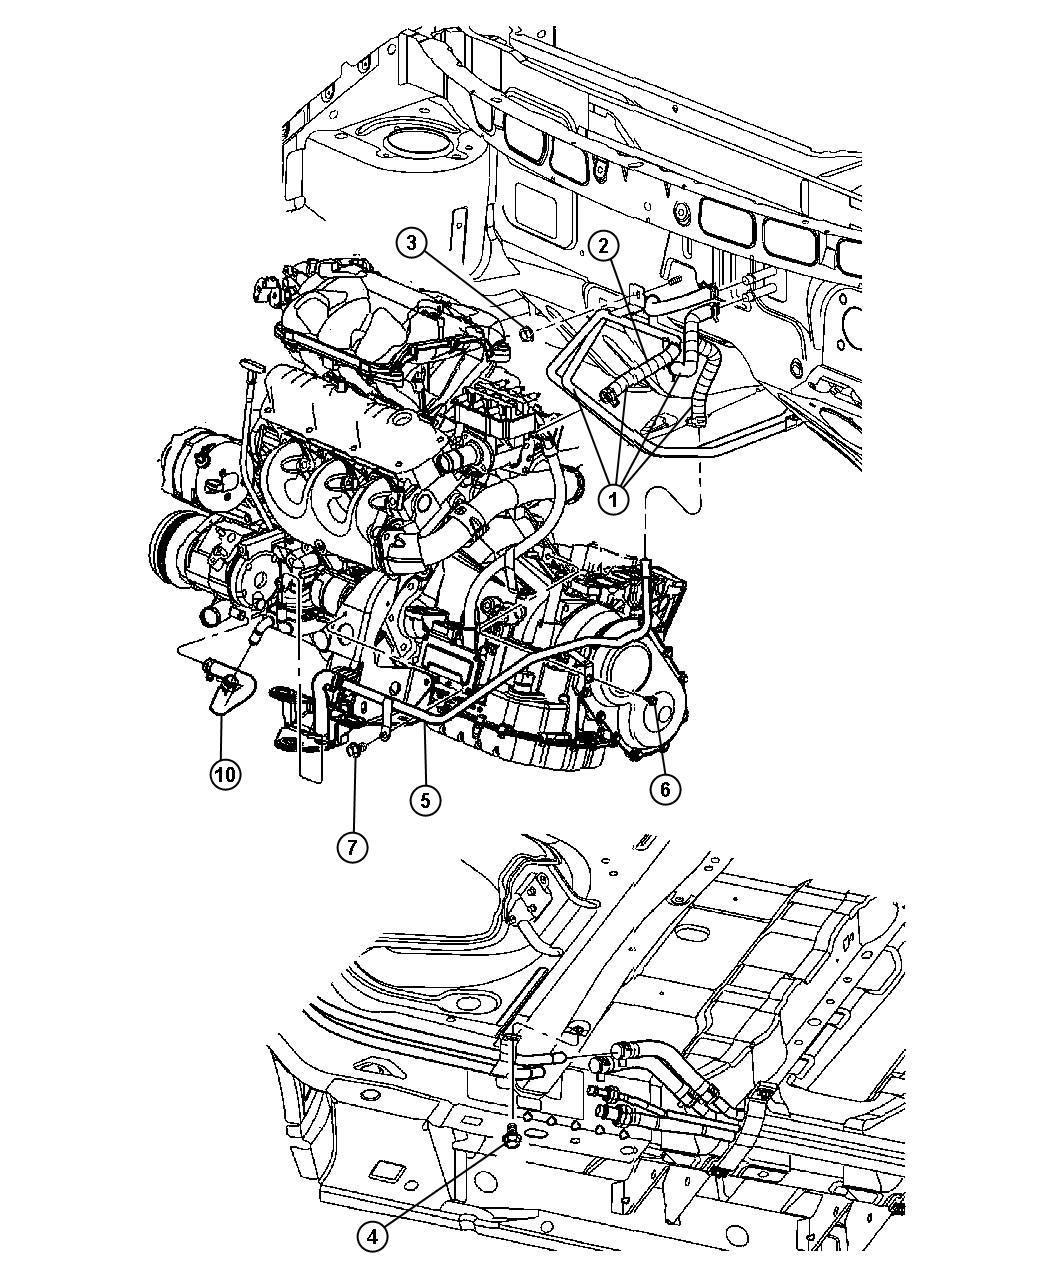 2002 Chrysler Hose. Heater supply w/aux. Heater. Waux